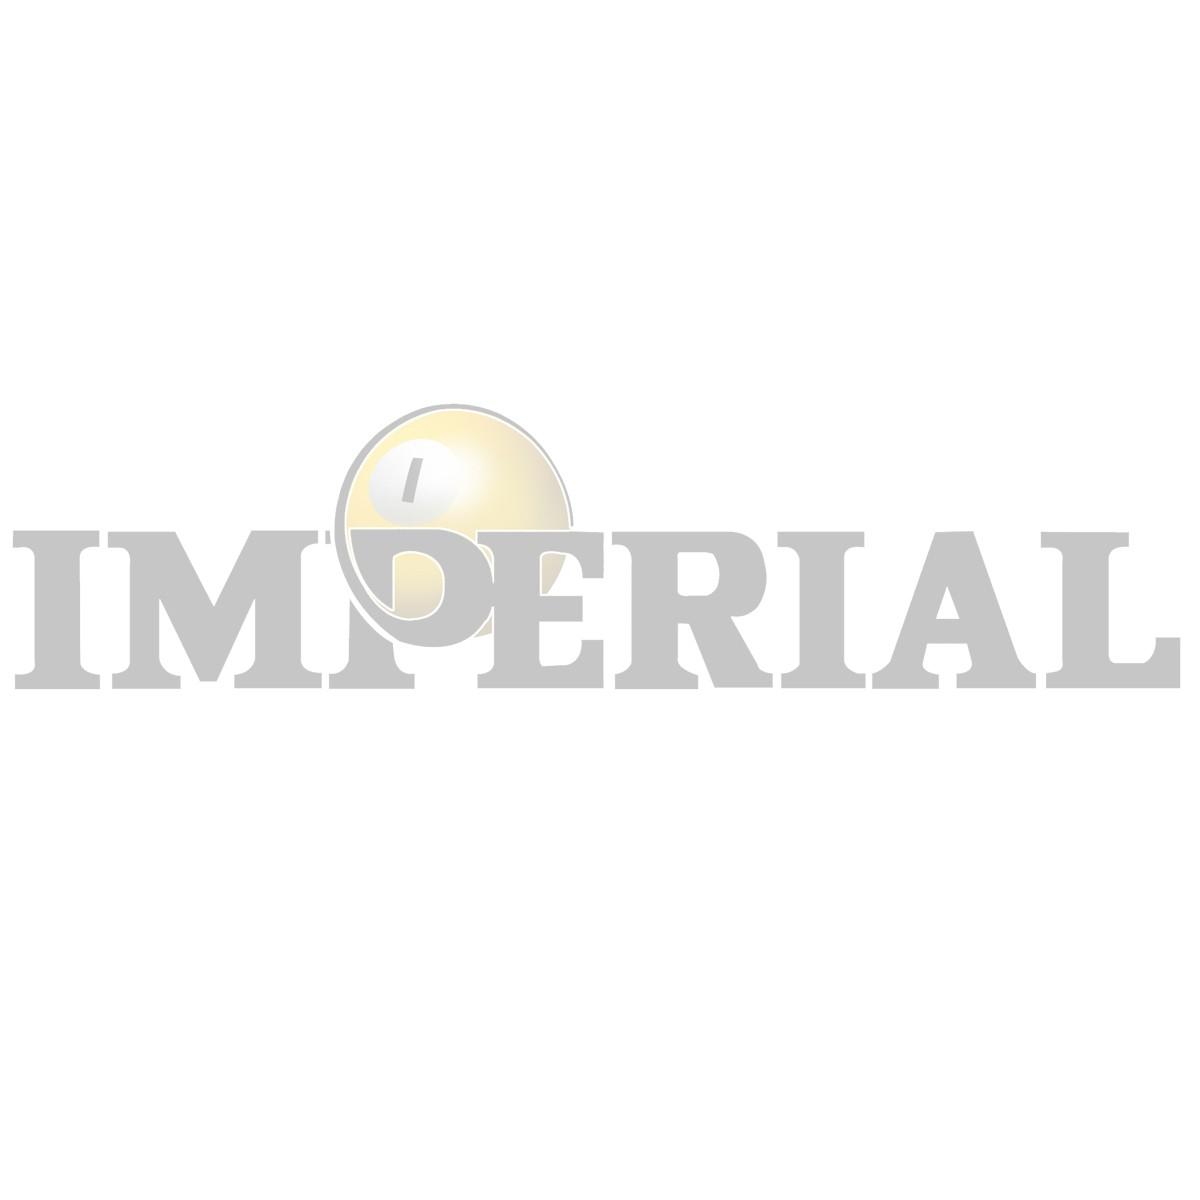 Washington Redskins Home vs. Away Billiard Ball Set